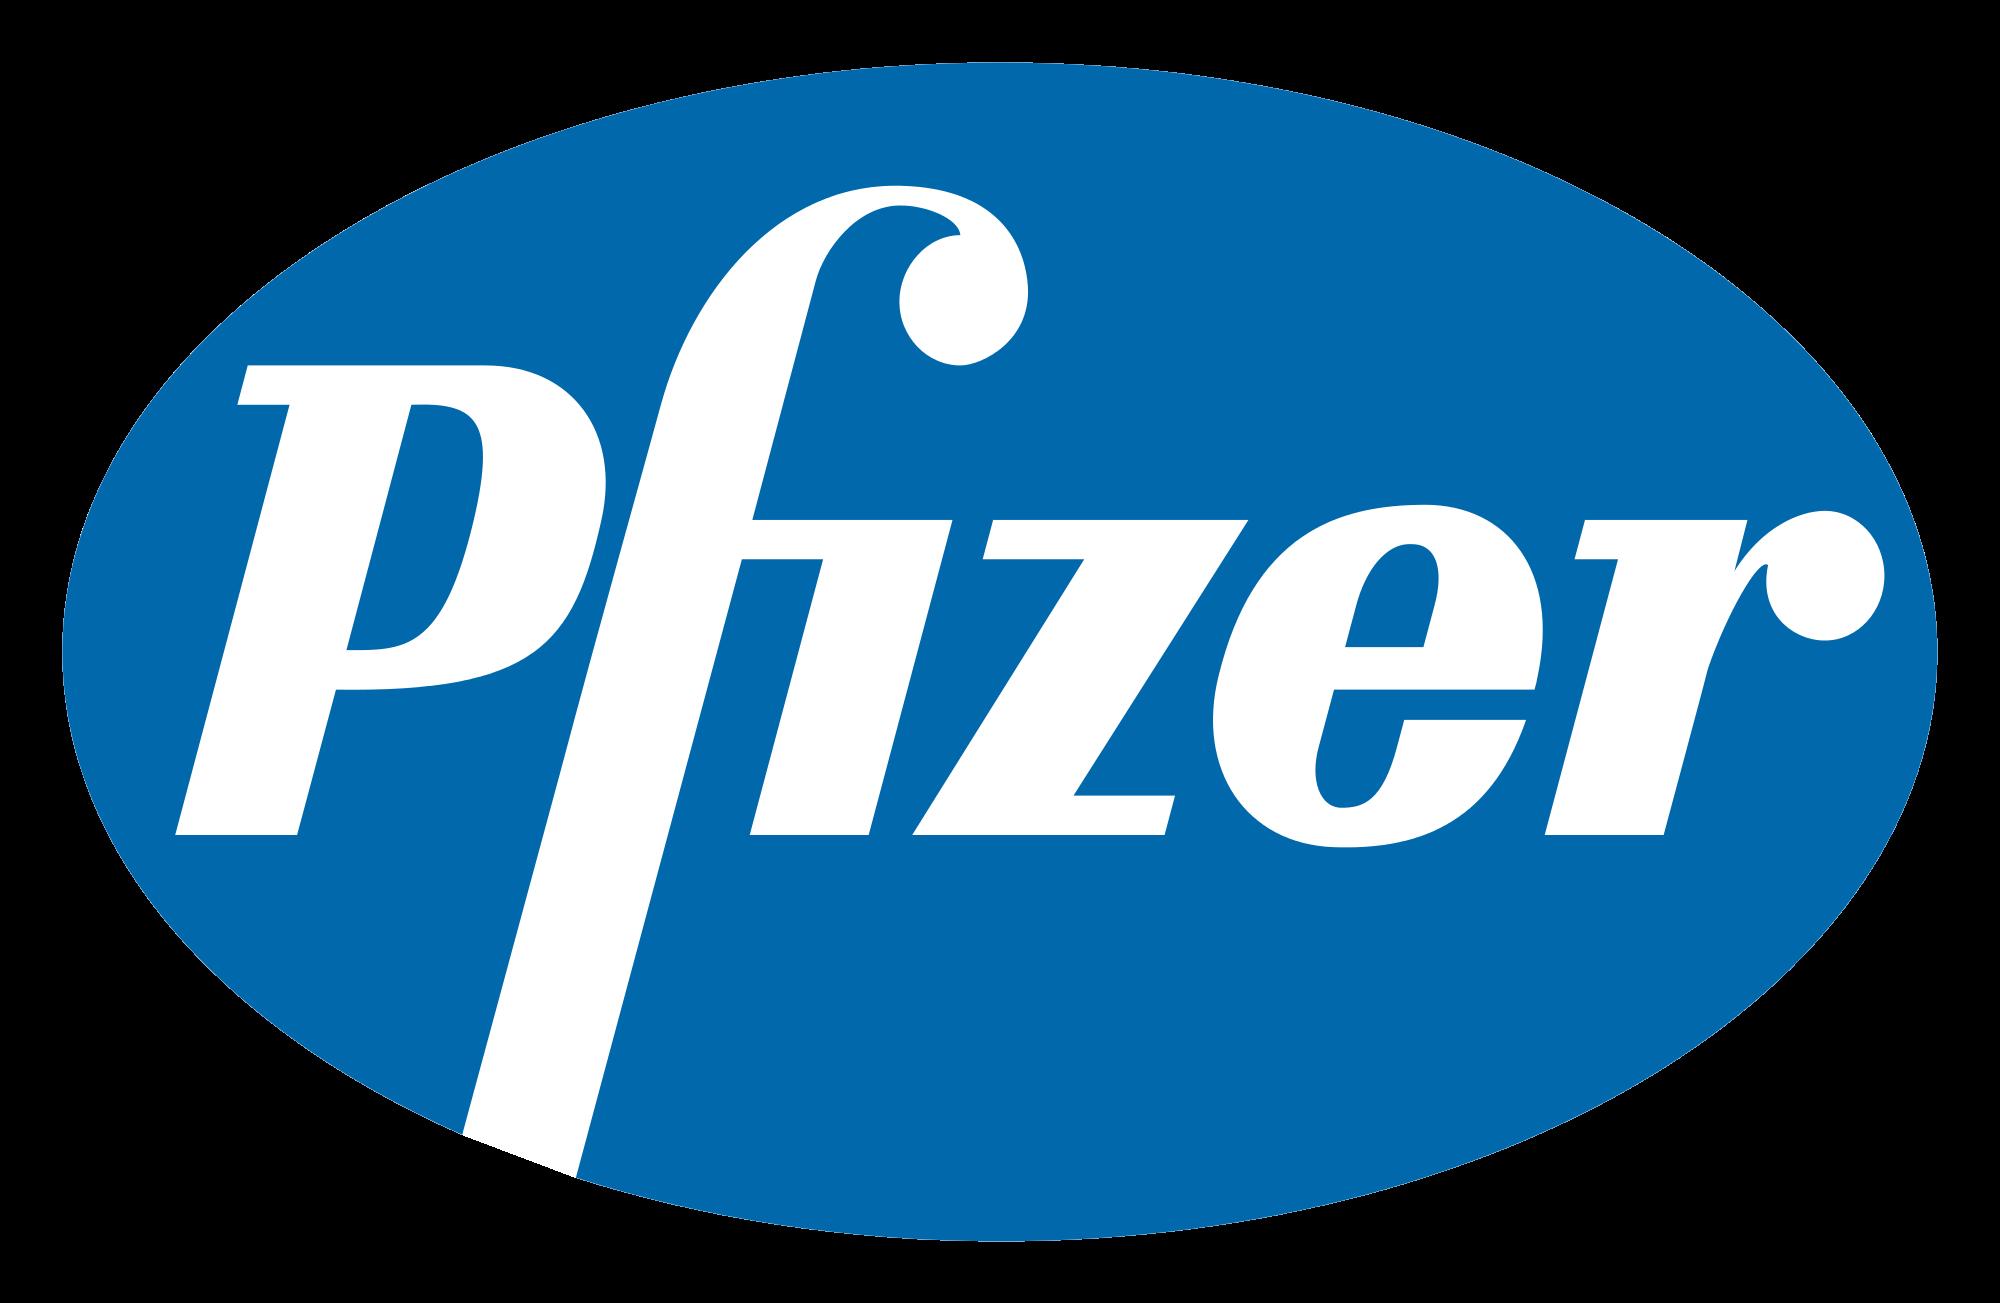 Pfizer_Logo_svg